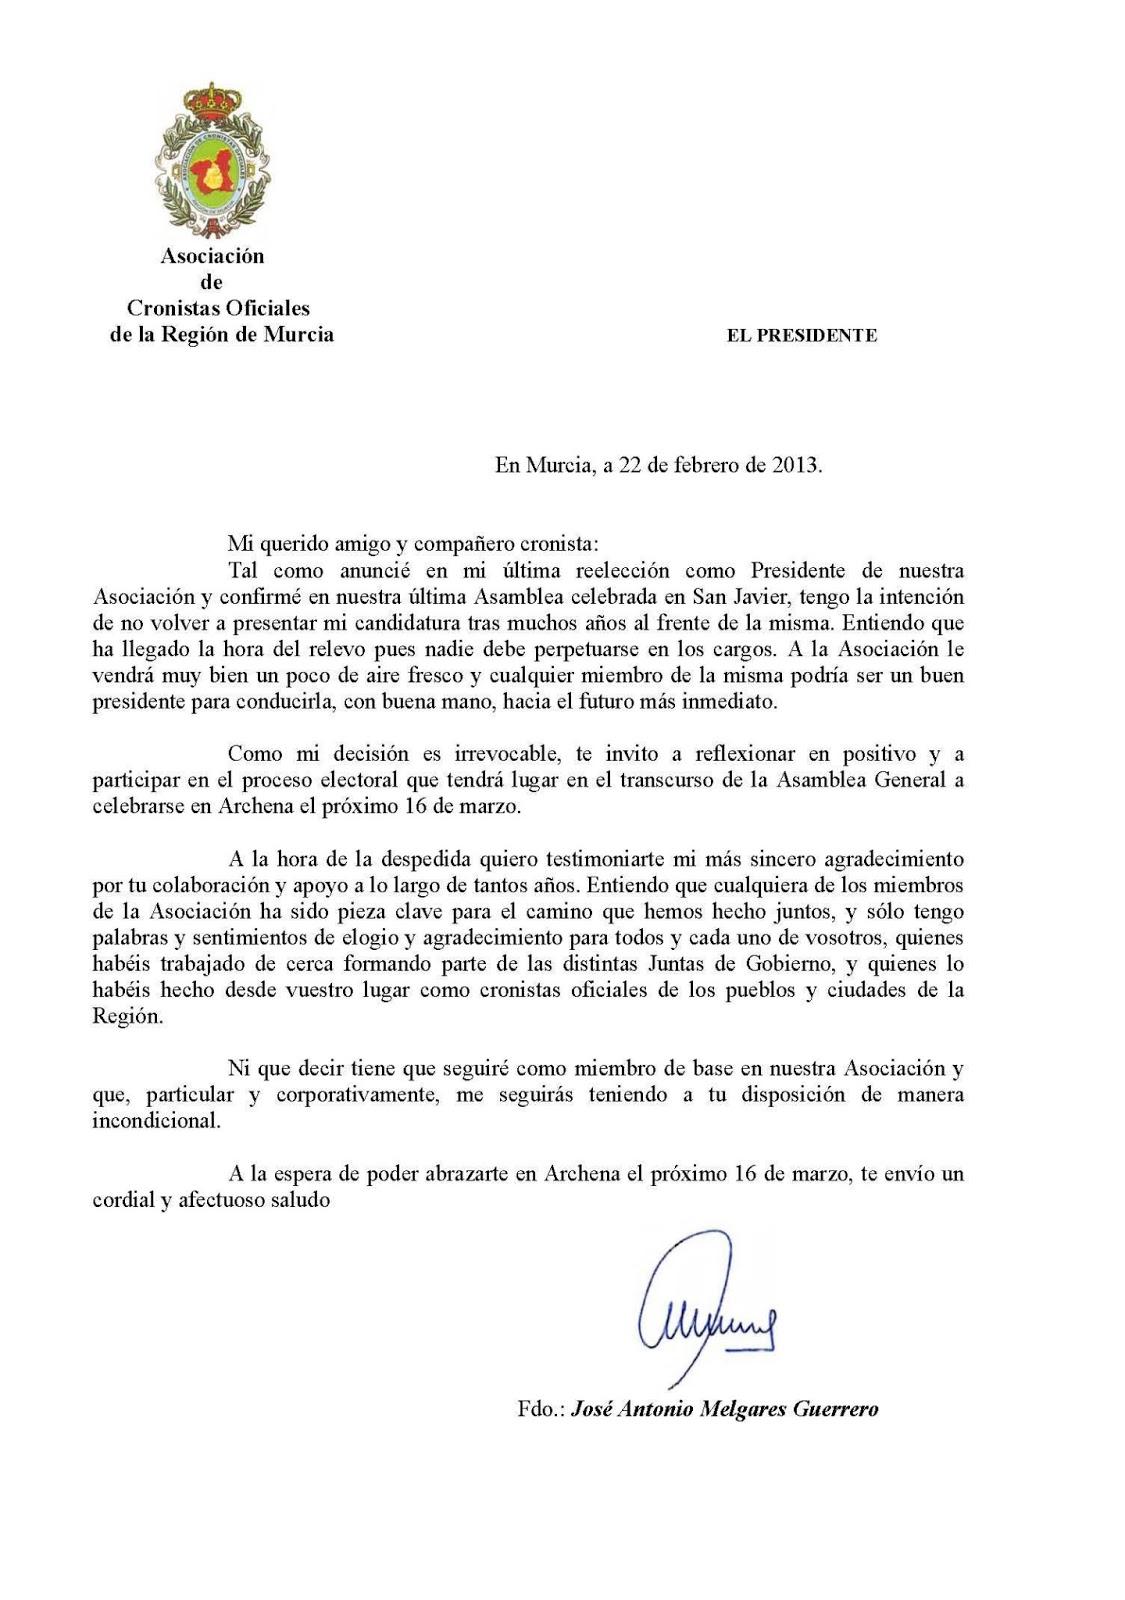 Carta De Despedida De Jandro  carta de despedida de